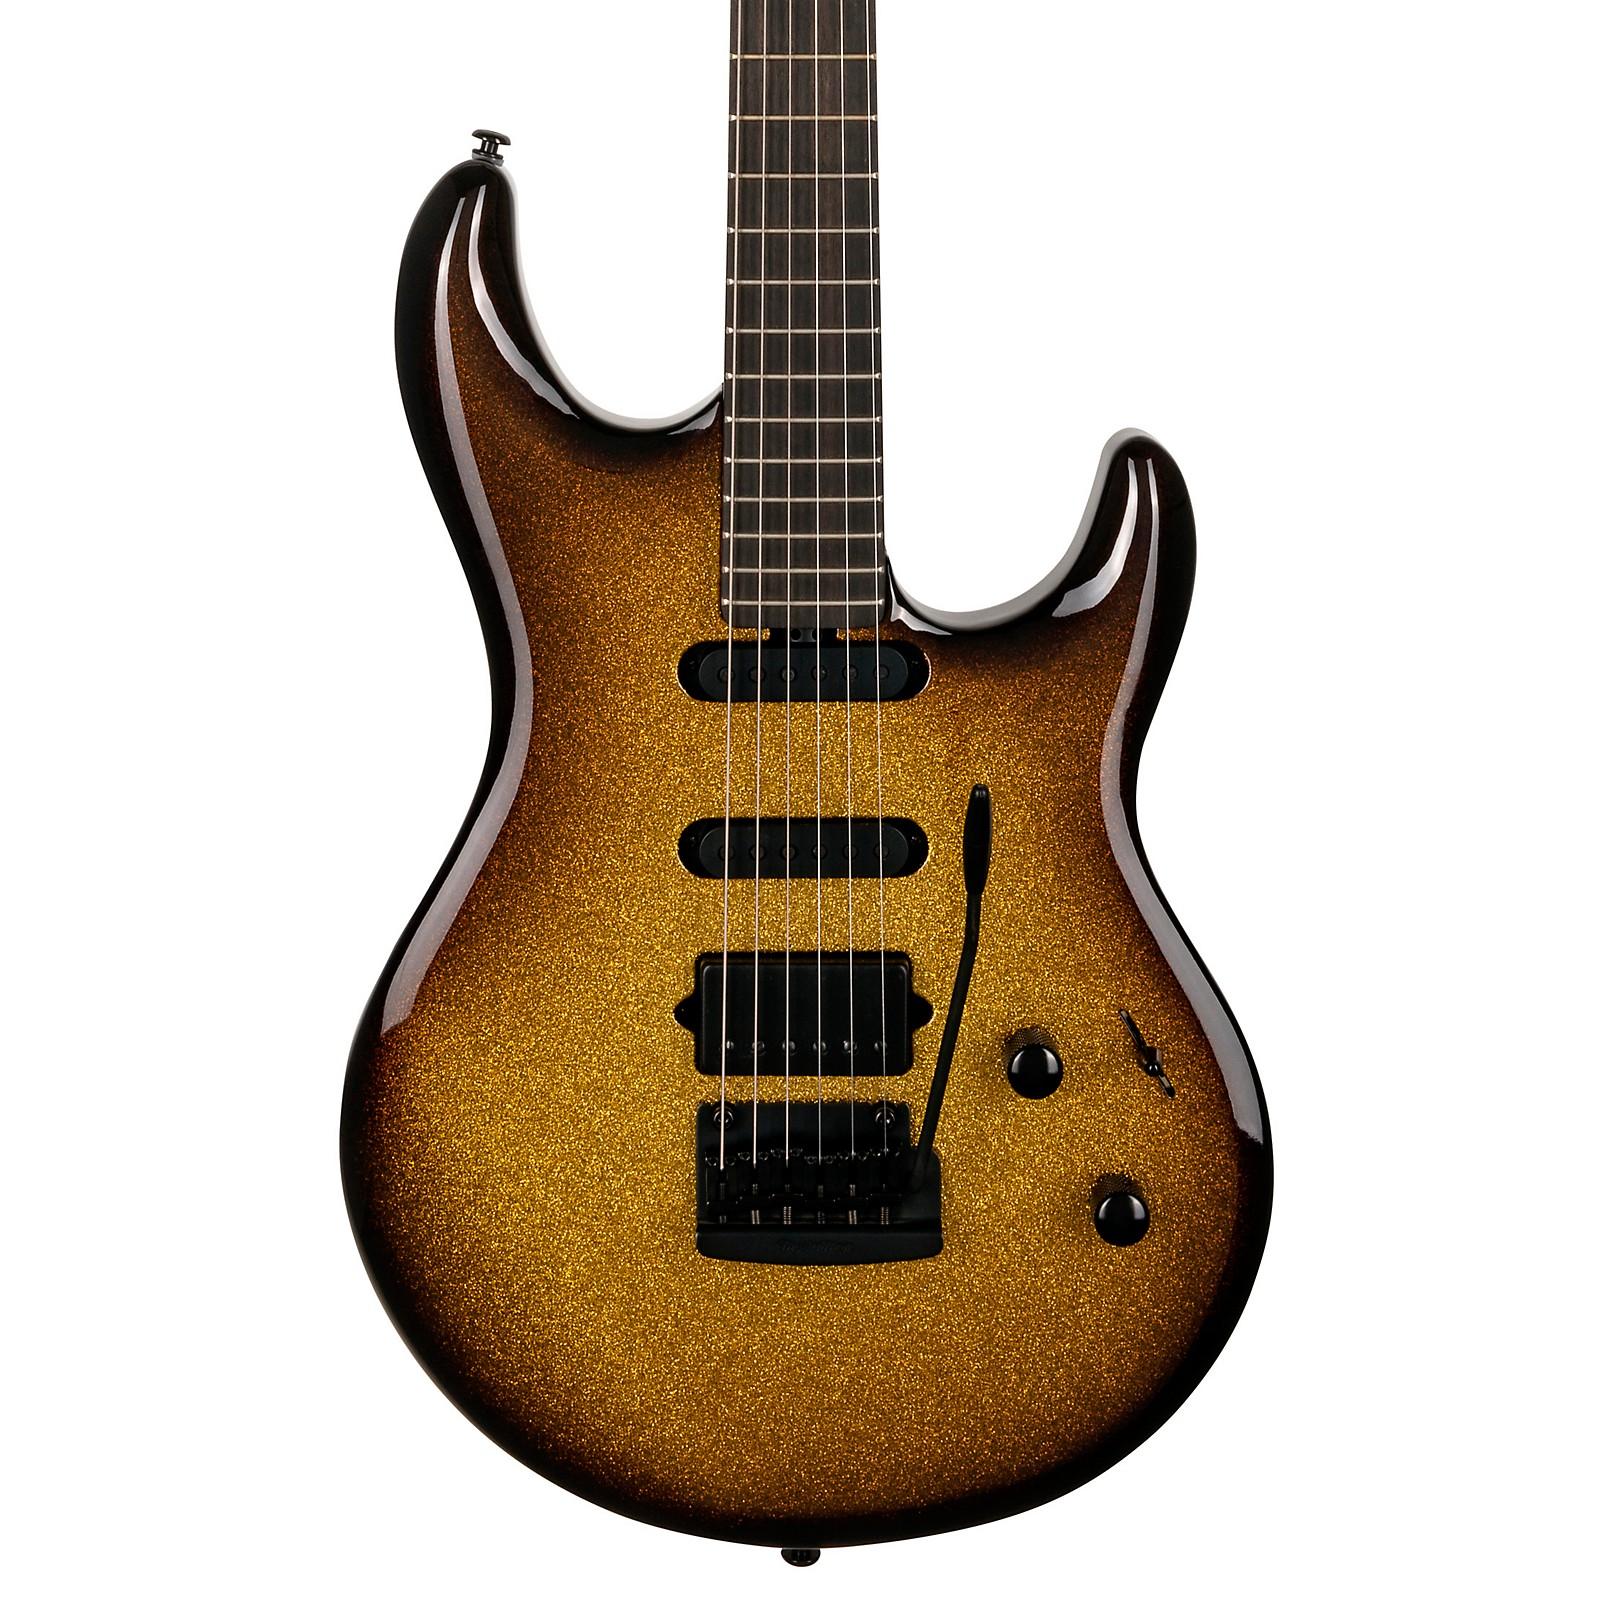 Ernie Ball Music Man Luke BFR Electric Guitar